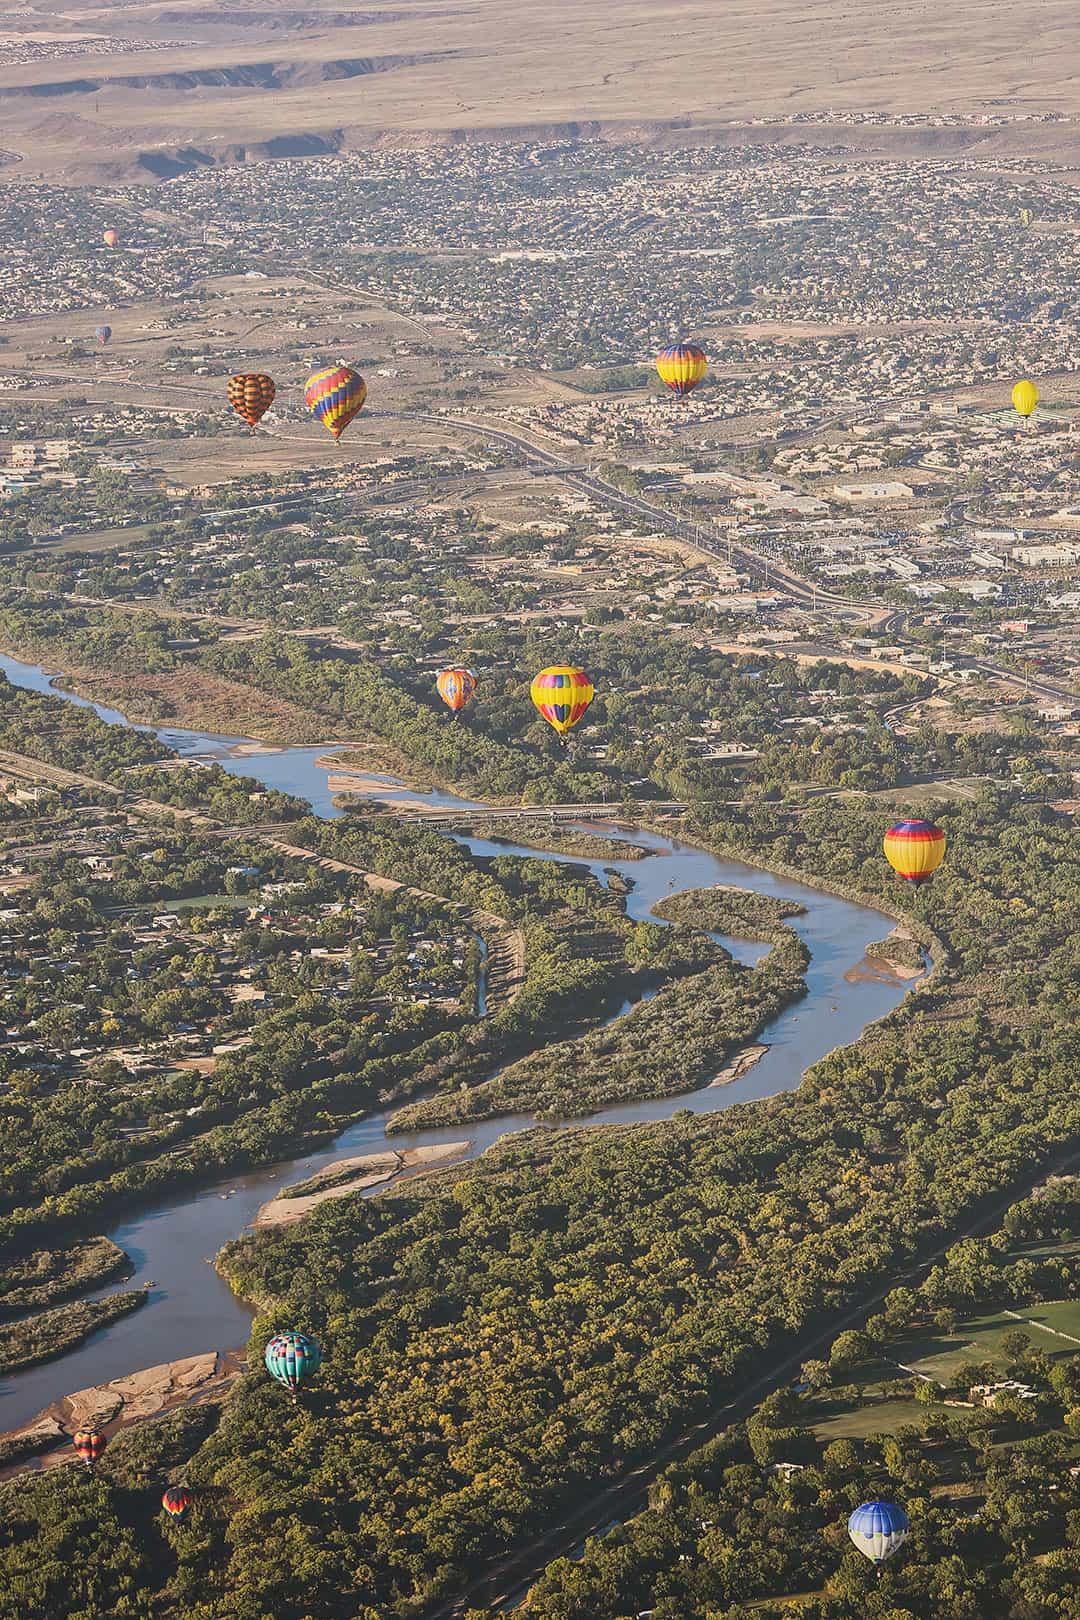 International Hot Air Balloon Festival New Mexico